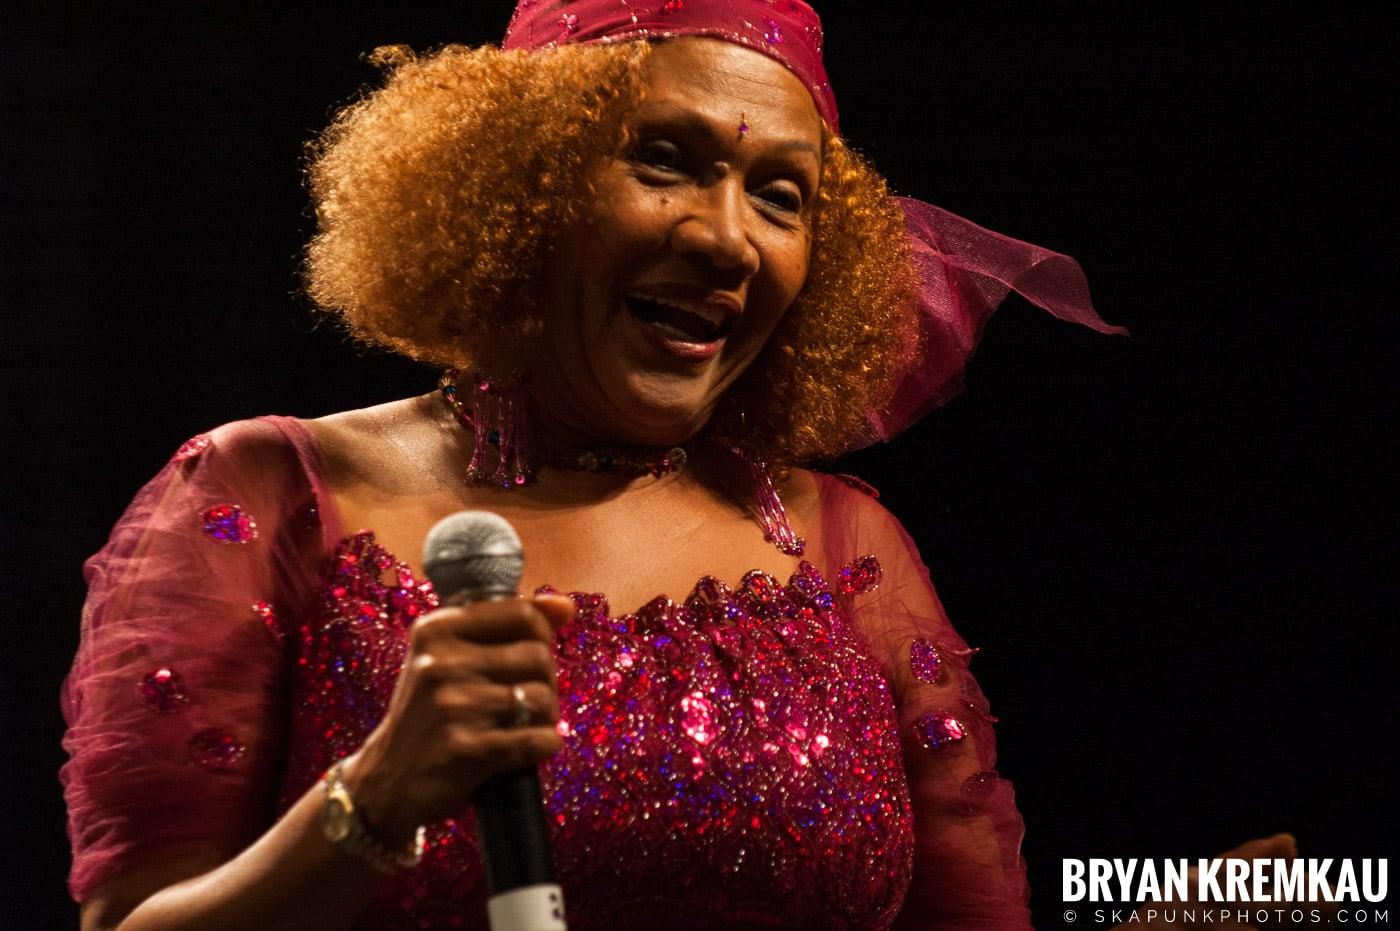 Marcia Griffiths @ Vintage Reggae Fest - Hammerstein Ballroom, NYC - 12.16.2007 (16)